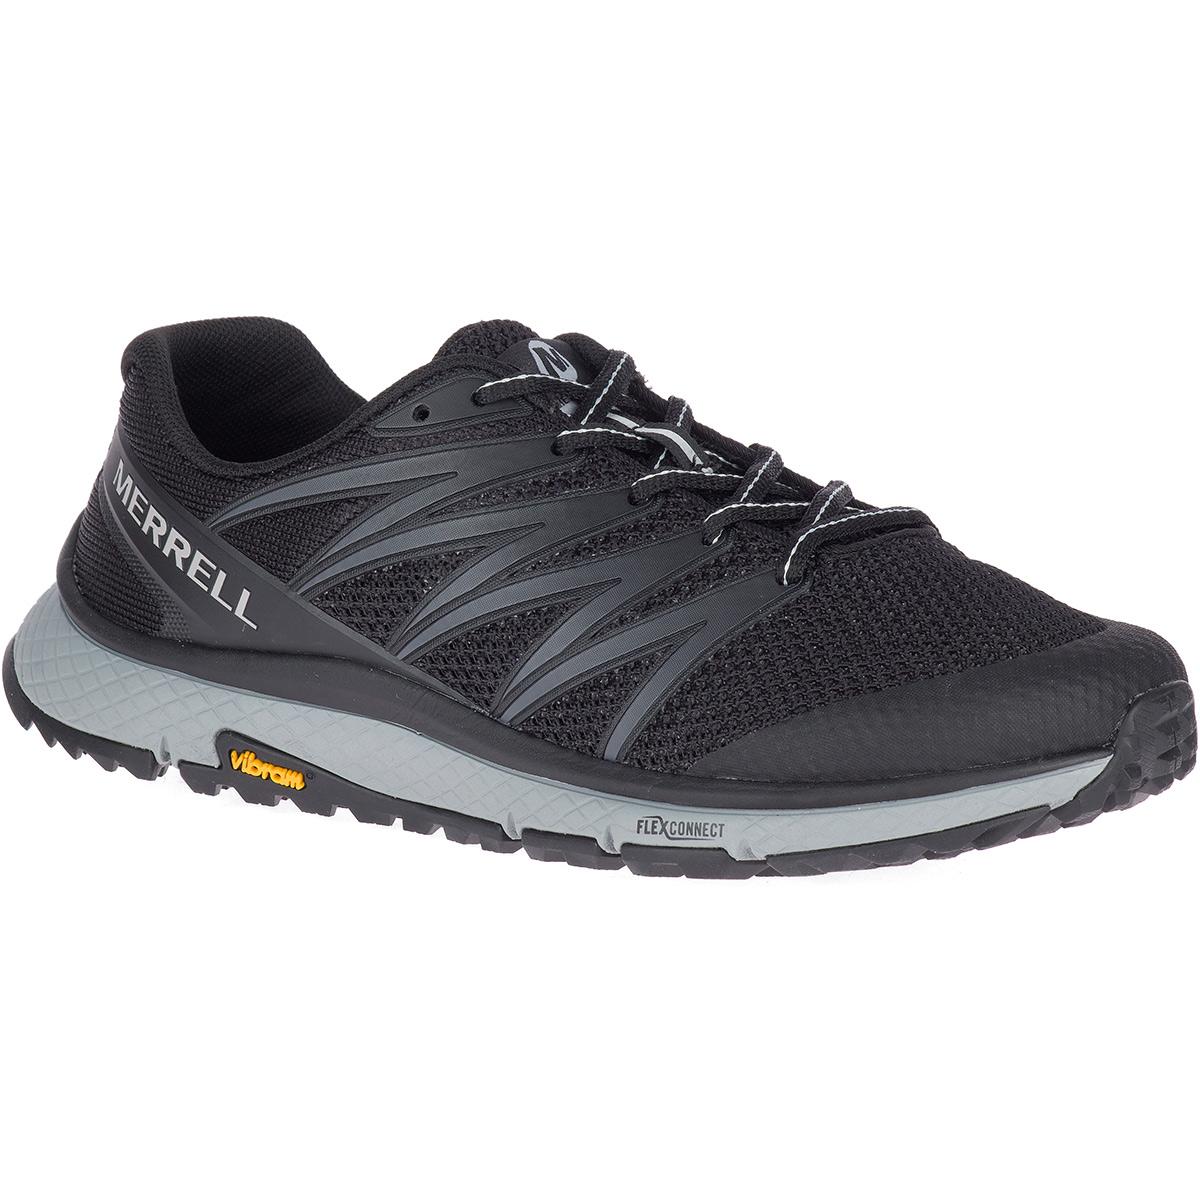 Merrell Women's Bare Access Xtr Trail Running Shoes - Black, 7.5